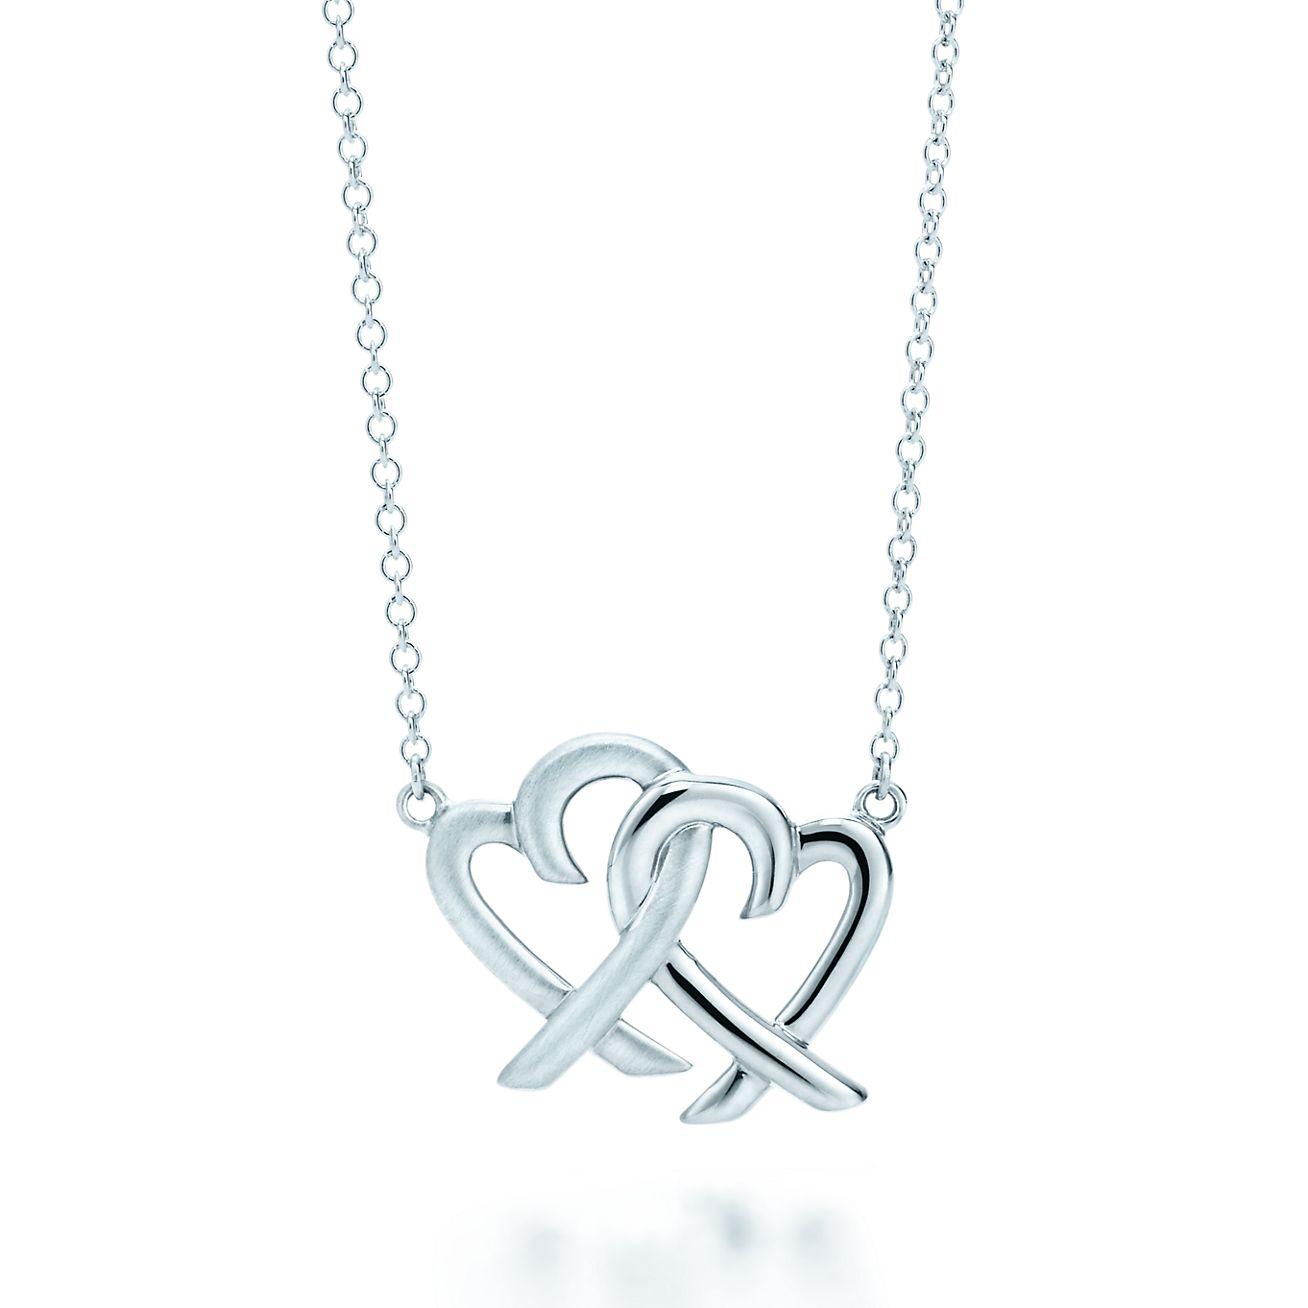 Paloma picasso loving heart interlocking pendant in sterling paloma picassoloving heart interlocking pendant aloadofball Image collections